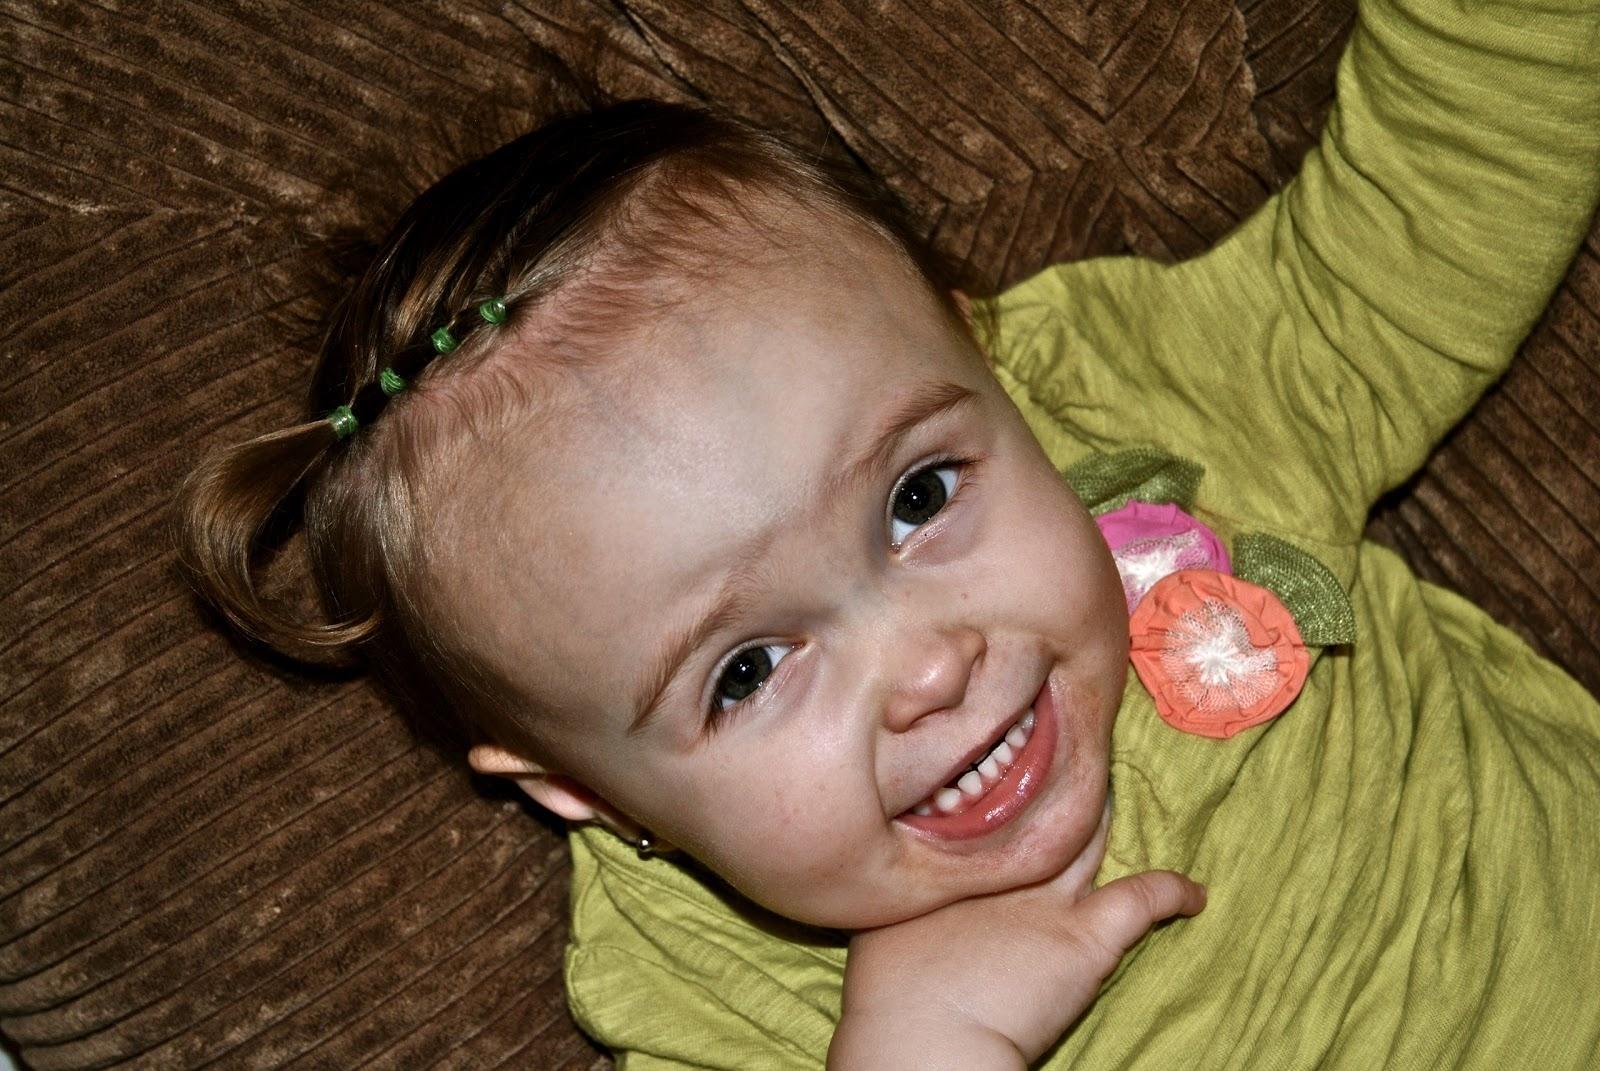 15 month old girl haircut - wavy haircut